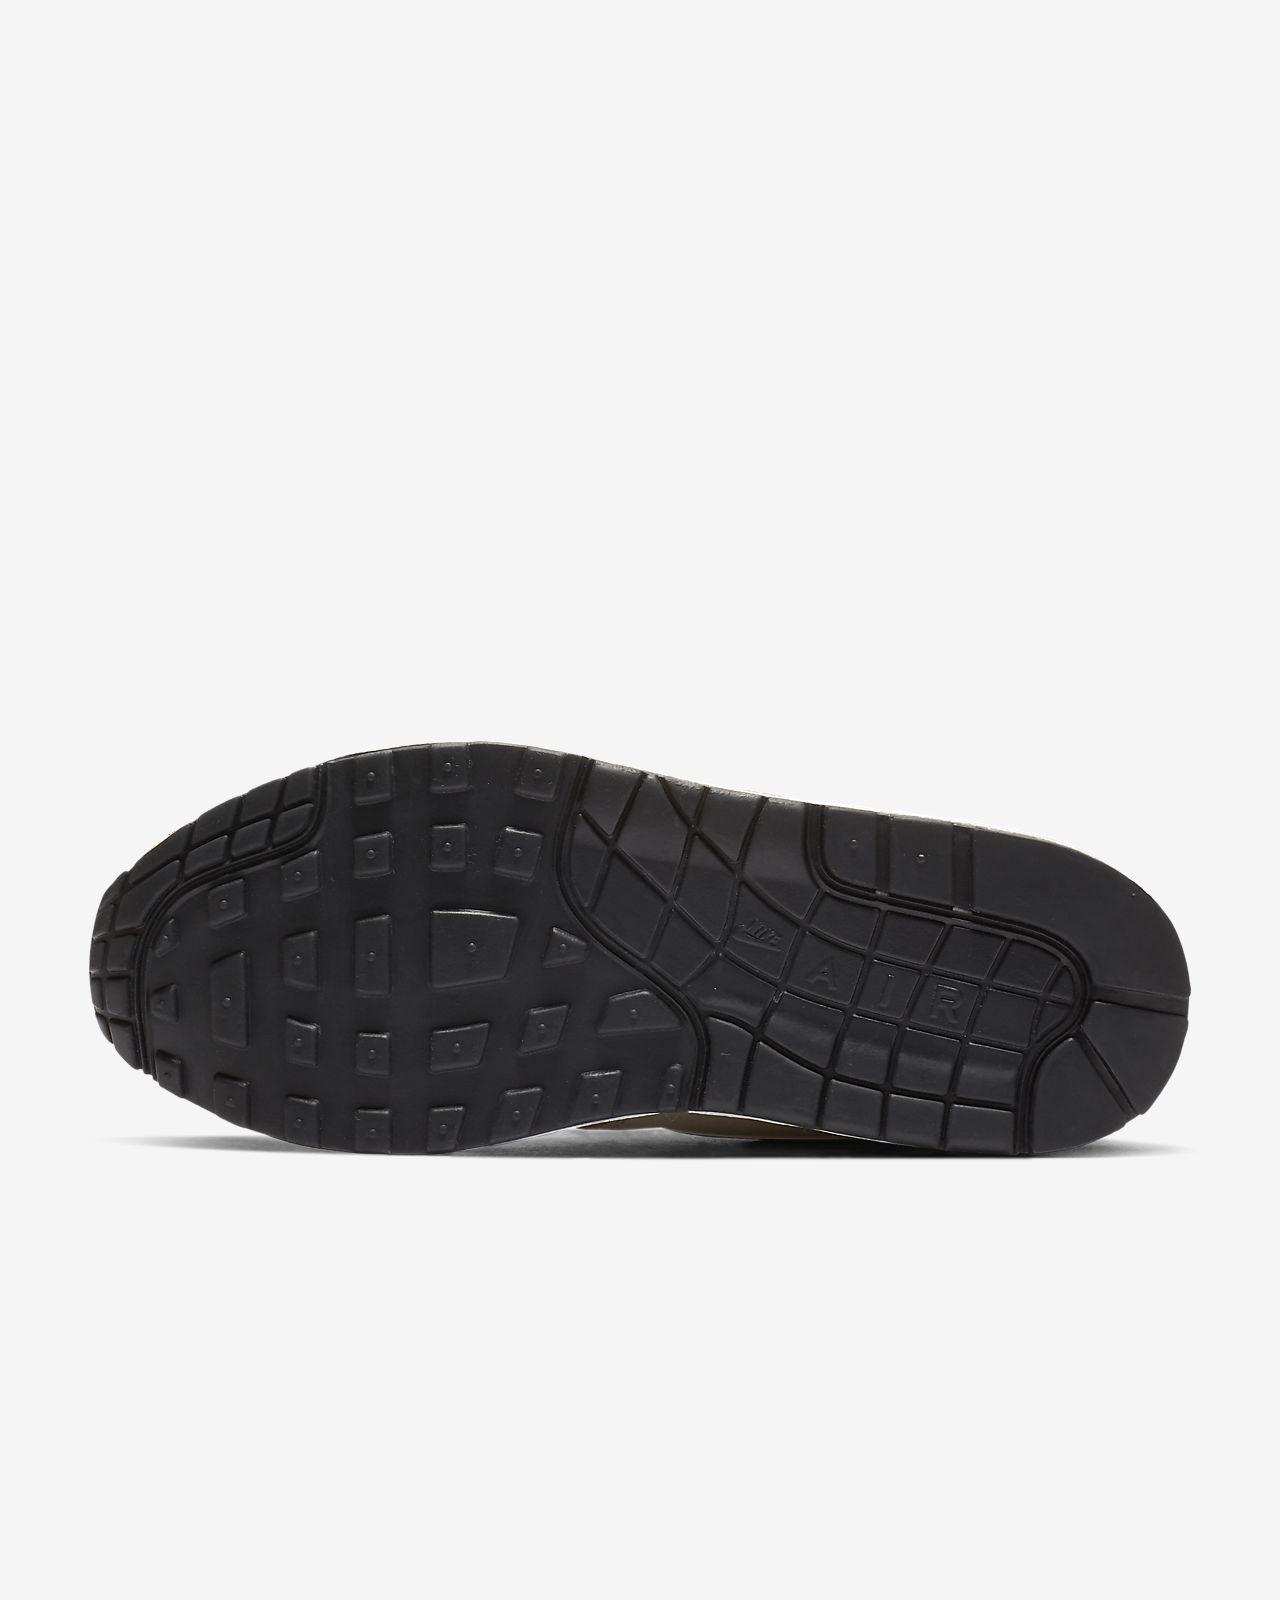 half off 39ea0 746a4 ... Nike Air Max 1 Premium Women s Shoe